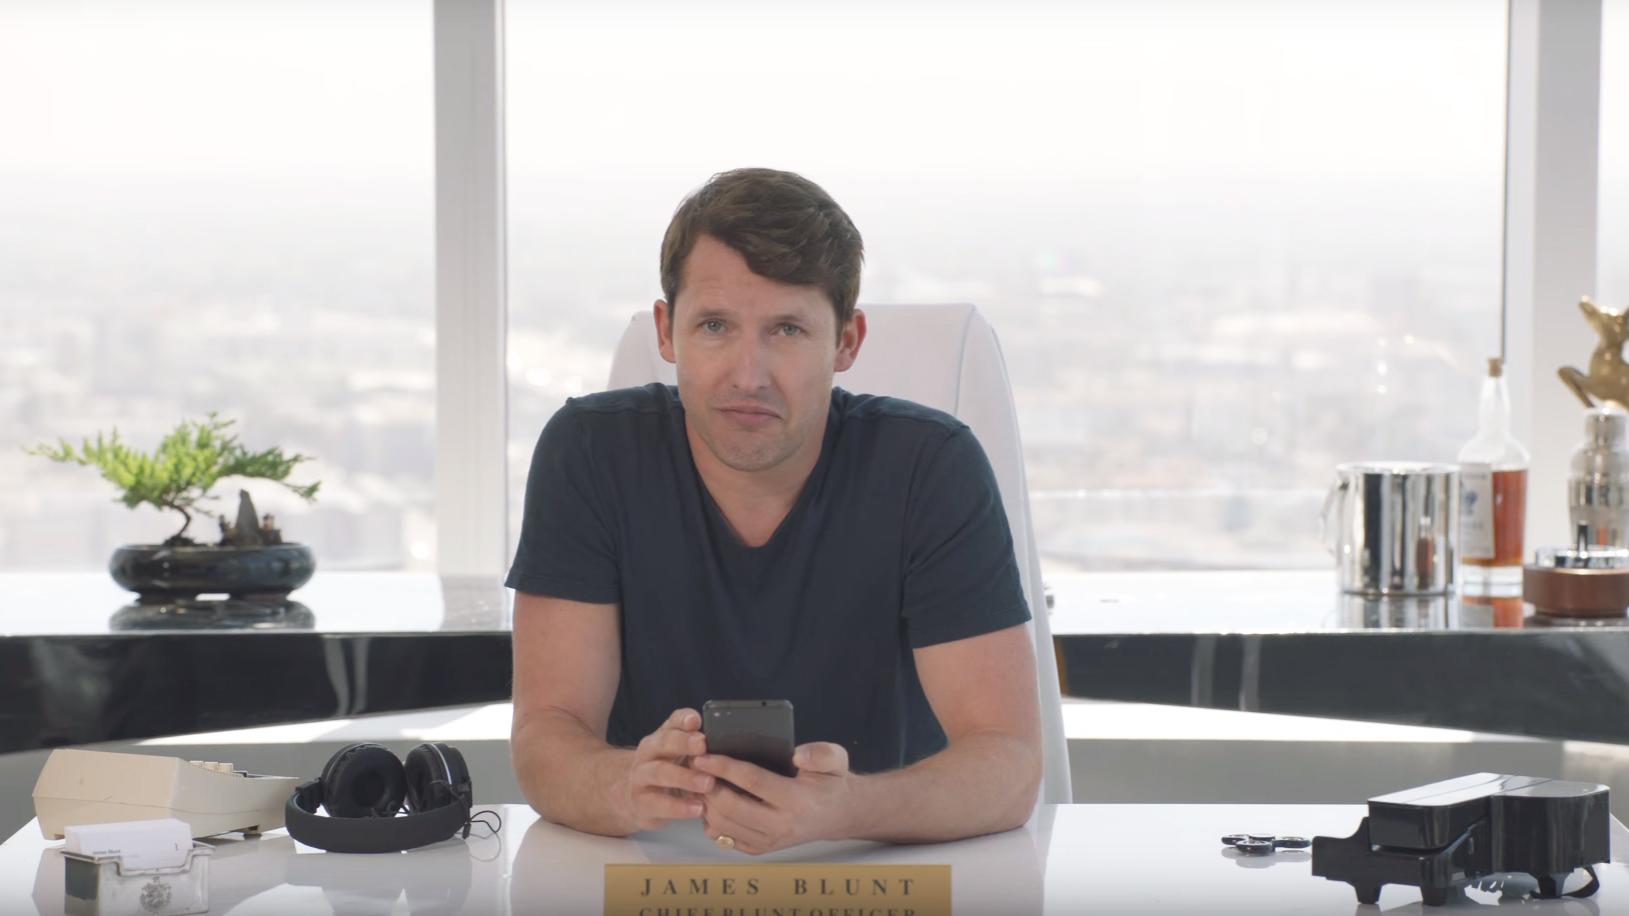 Jamesblunt teaser